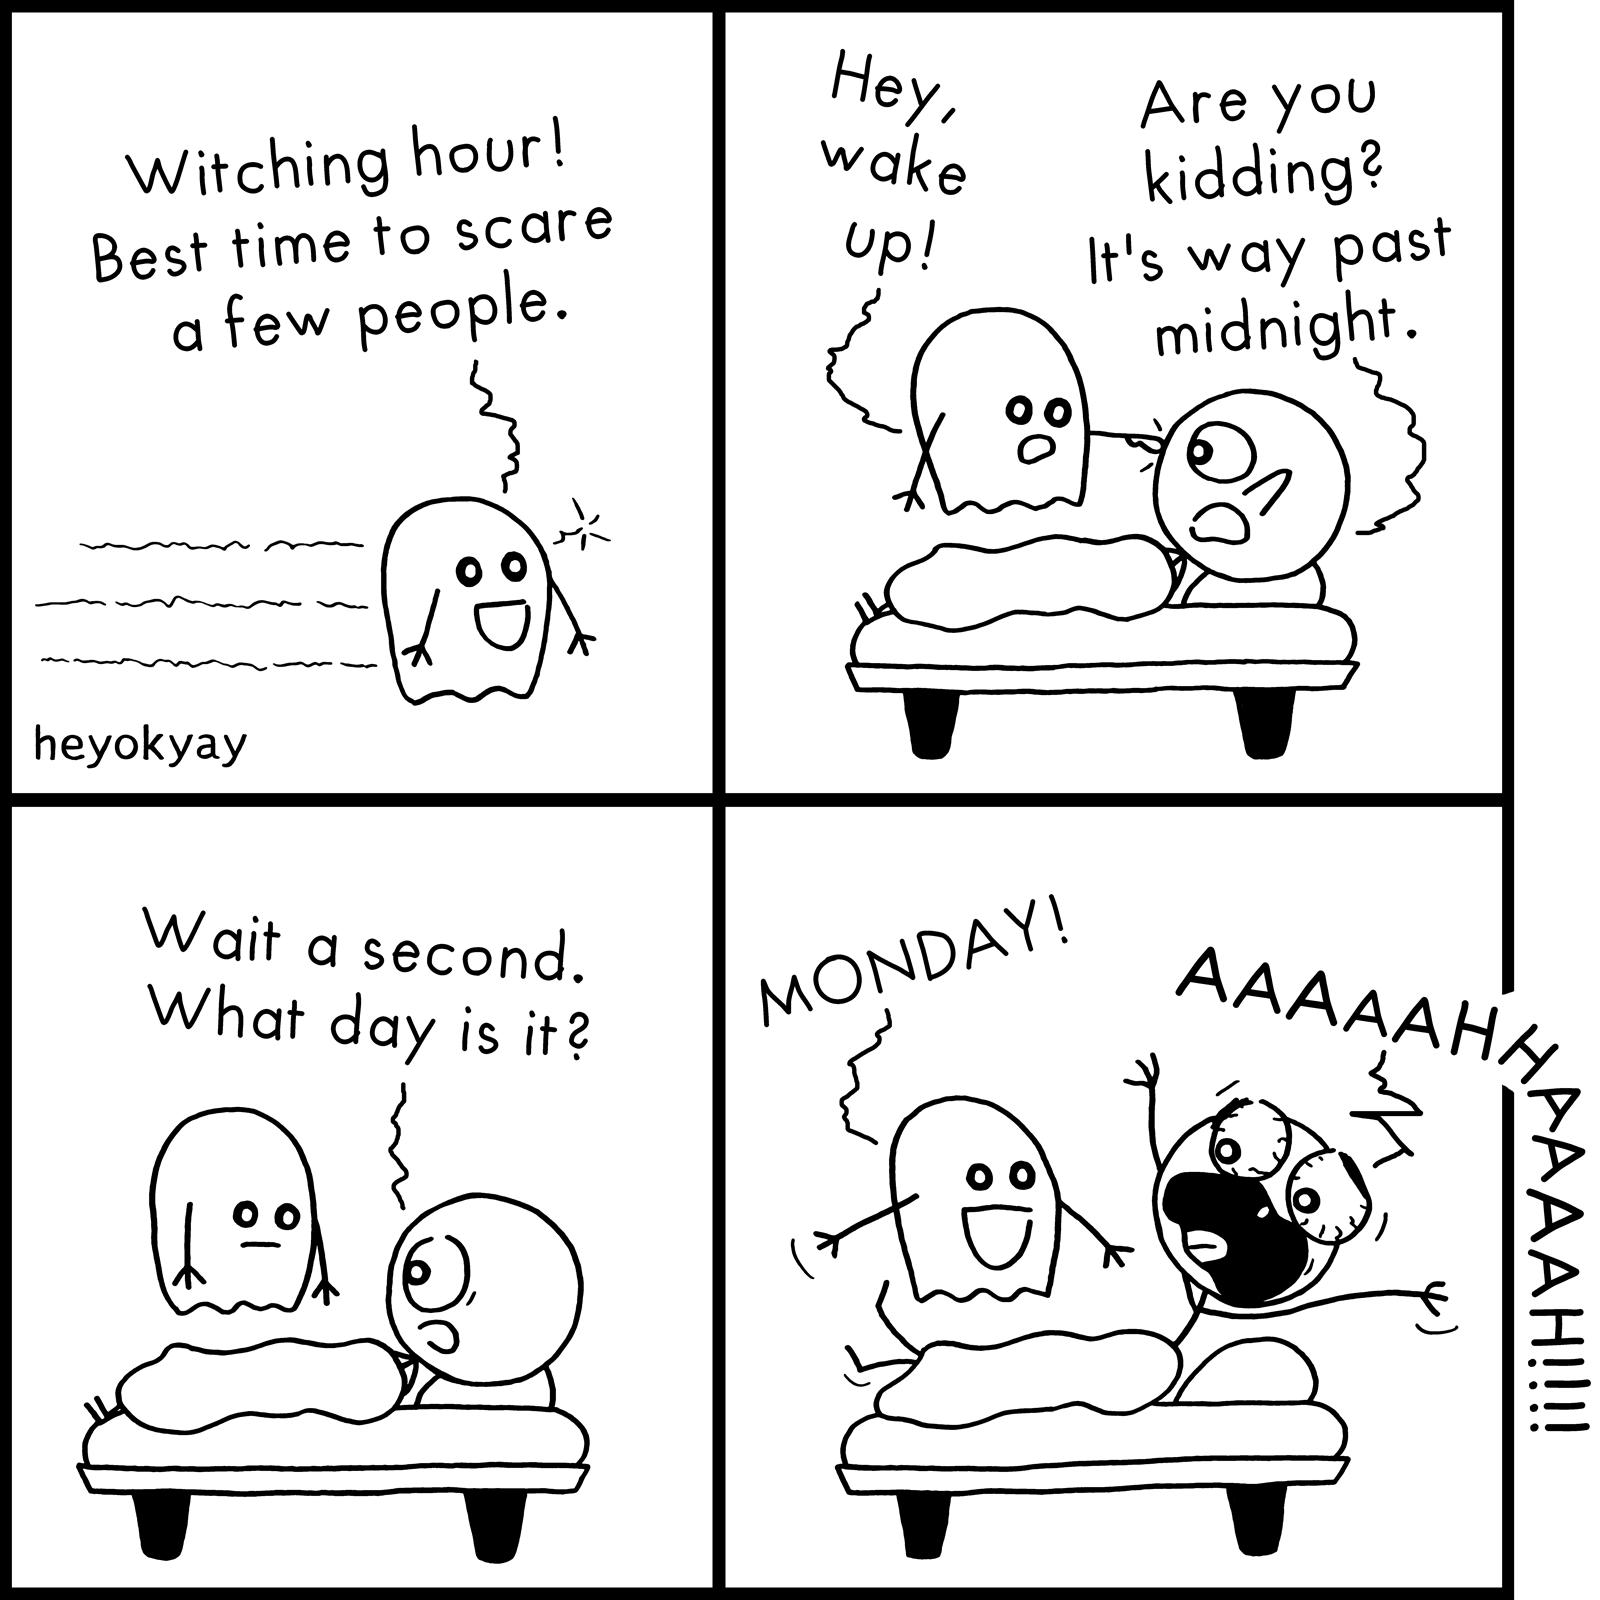 Witching Hour heyokyay comic